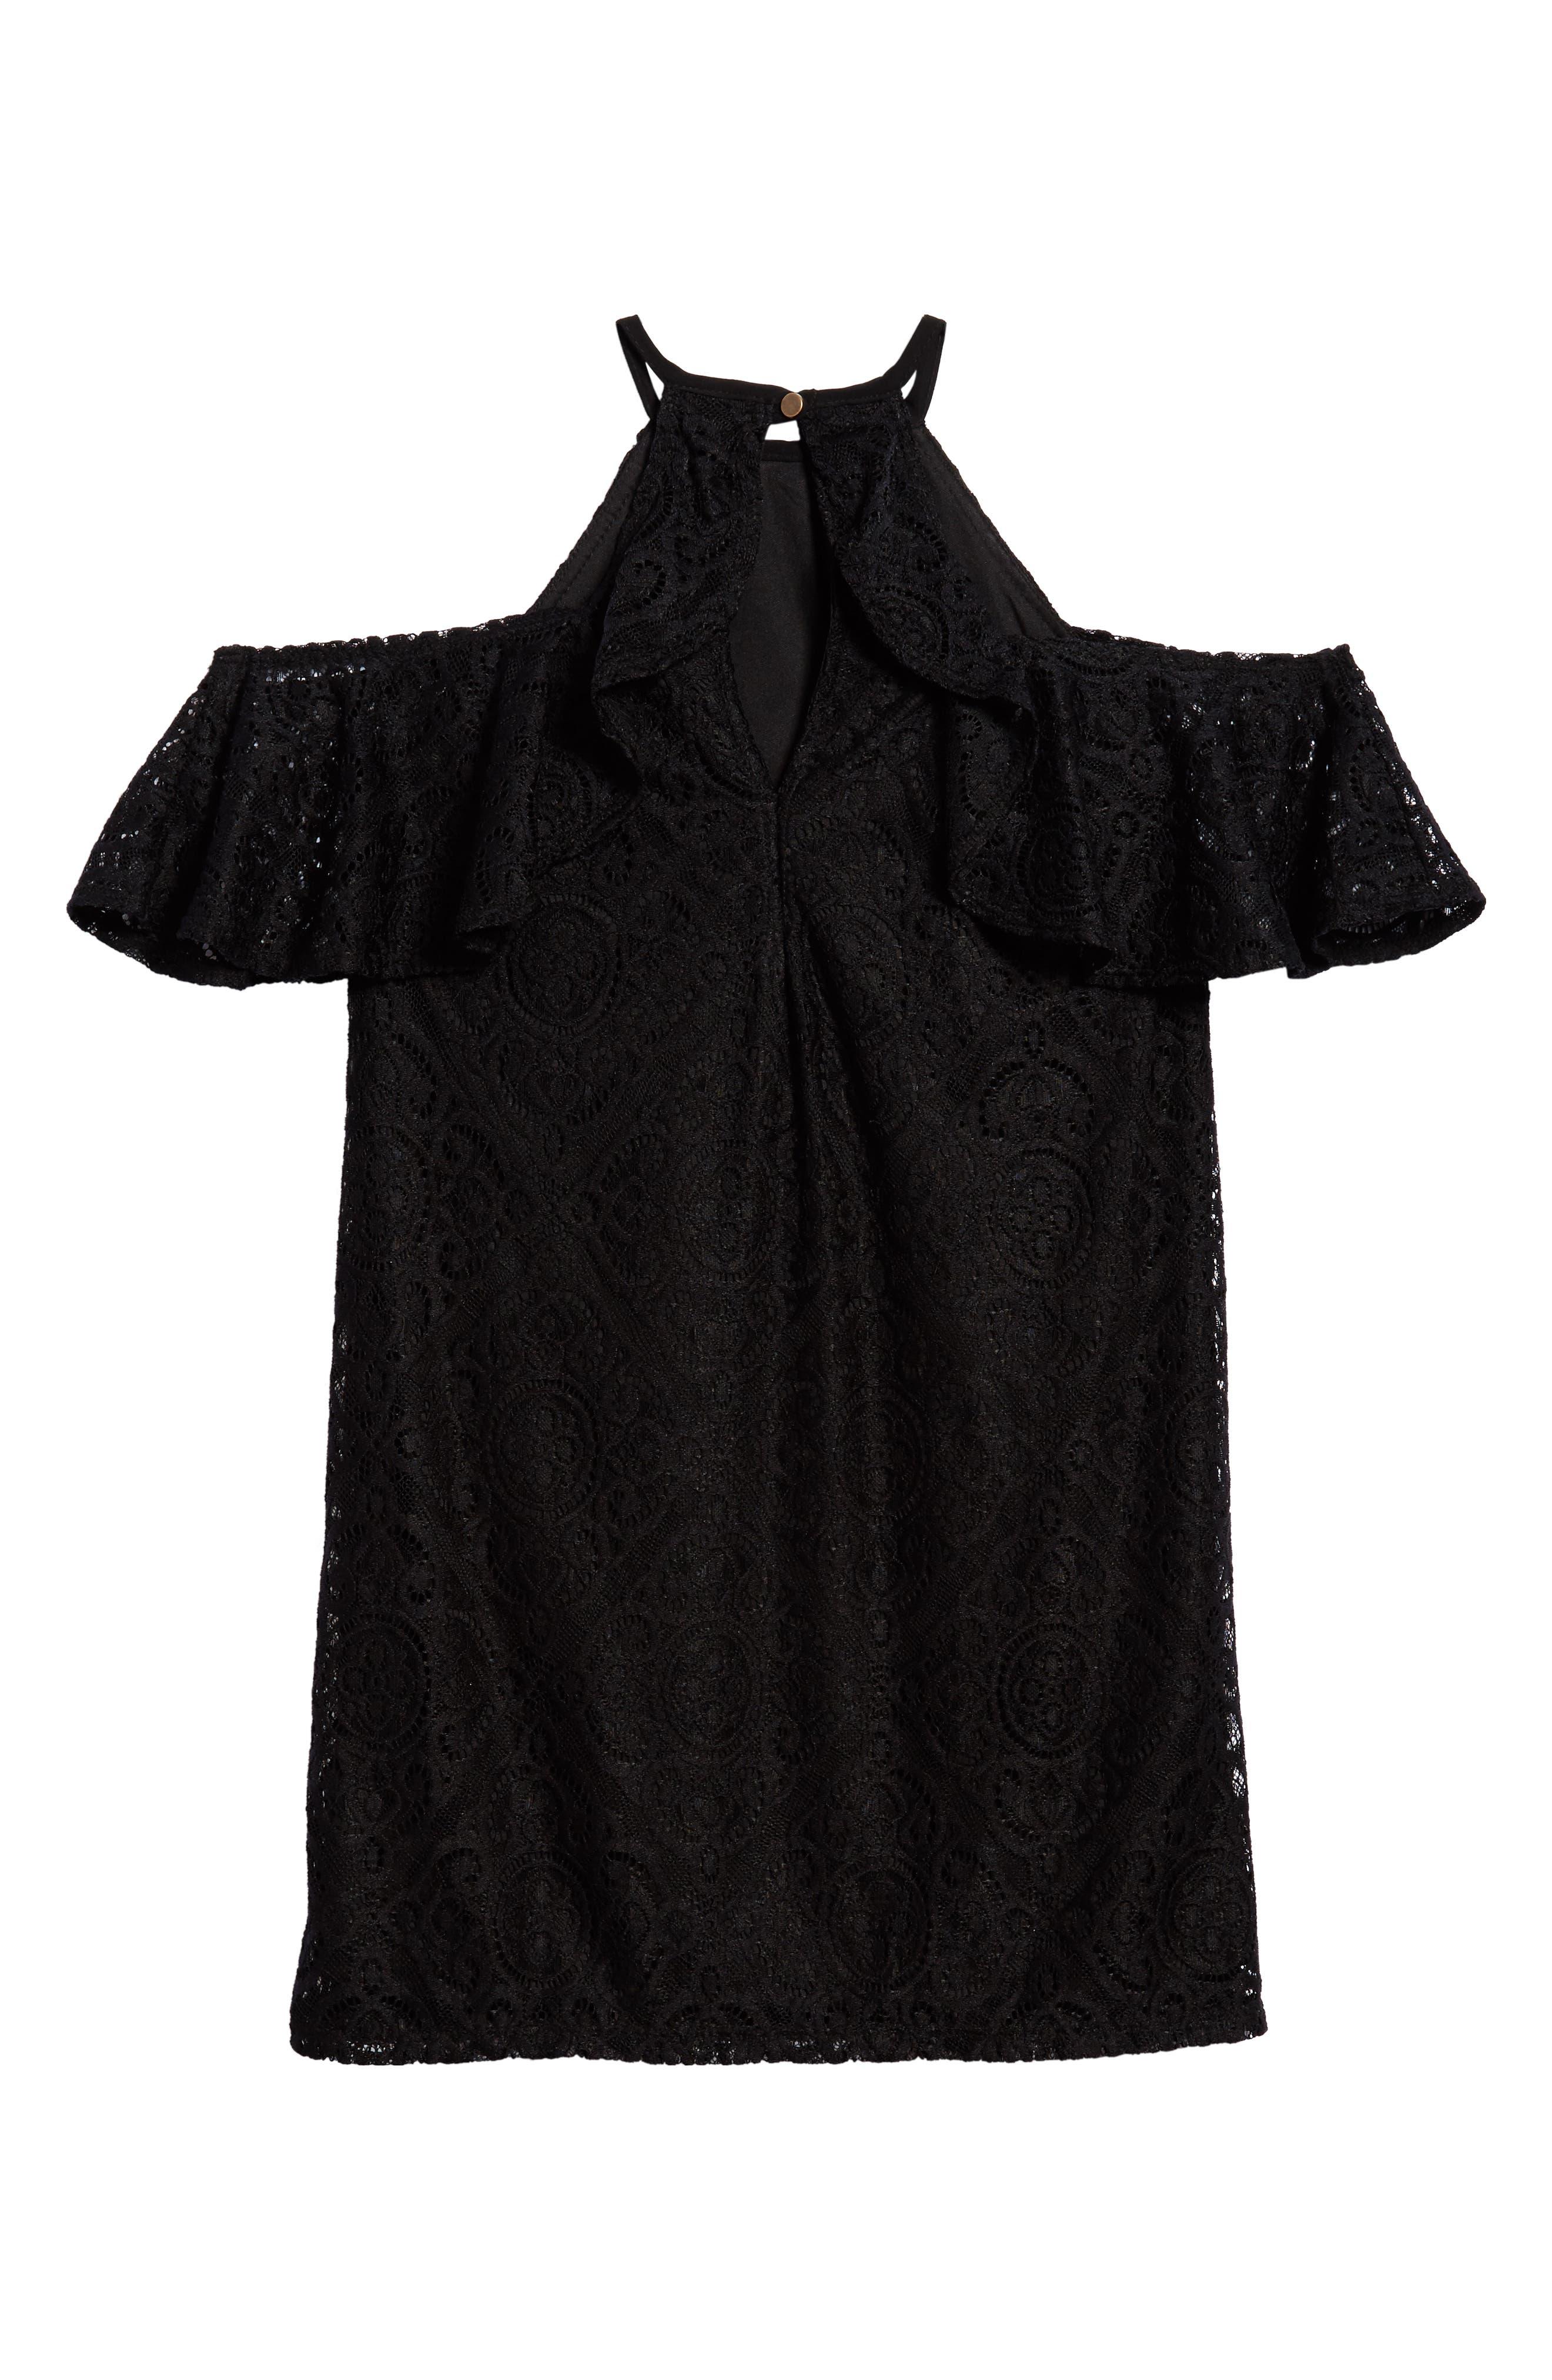 Lace Ruffle Cold Shoulder Dress,                             Alternate thumbnail 2, color,                             Black